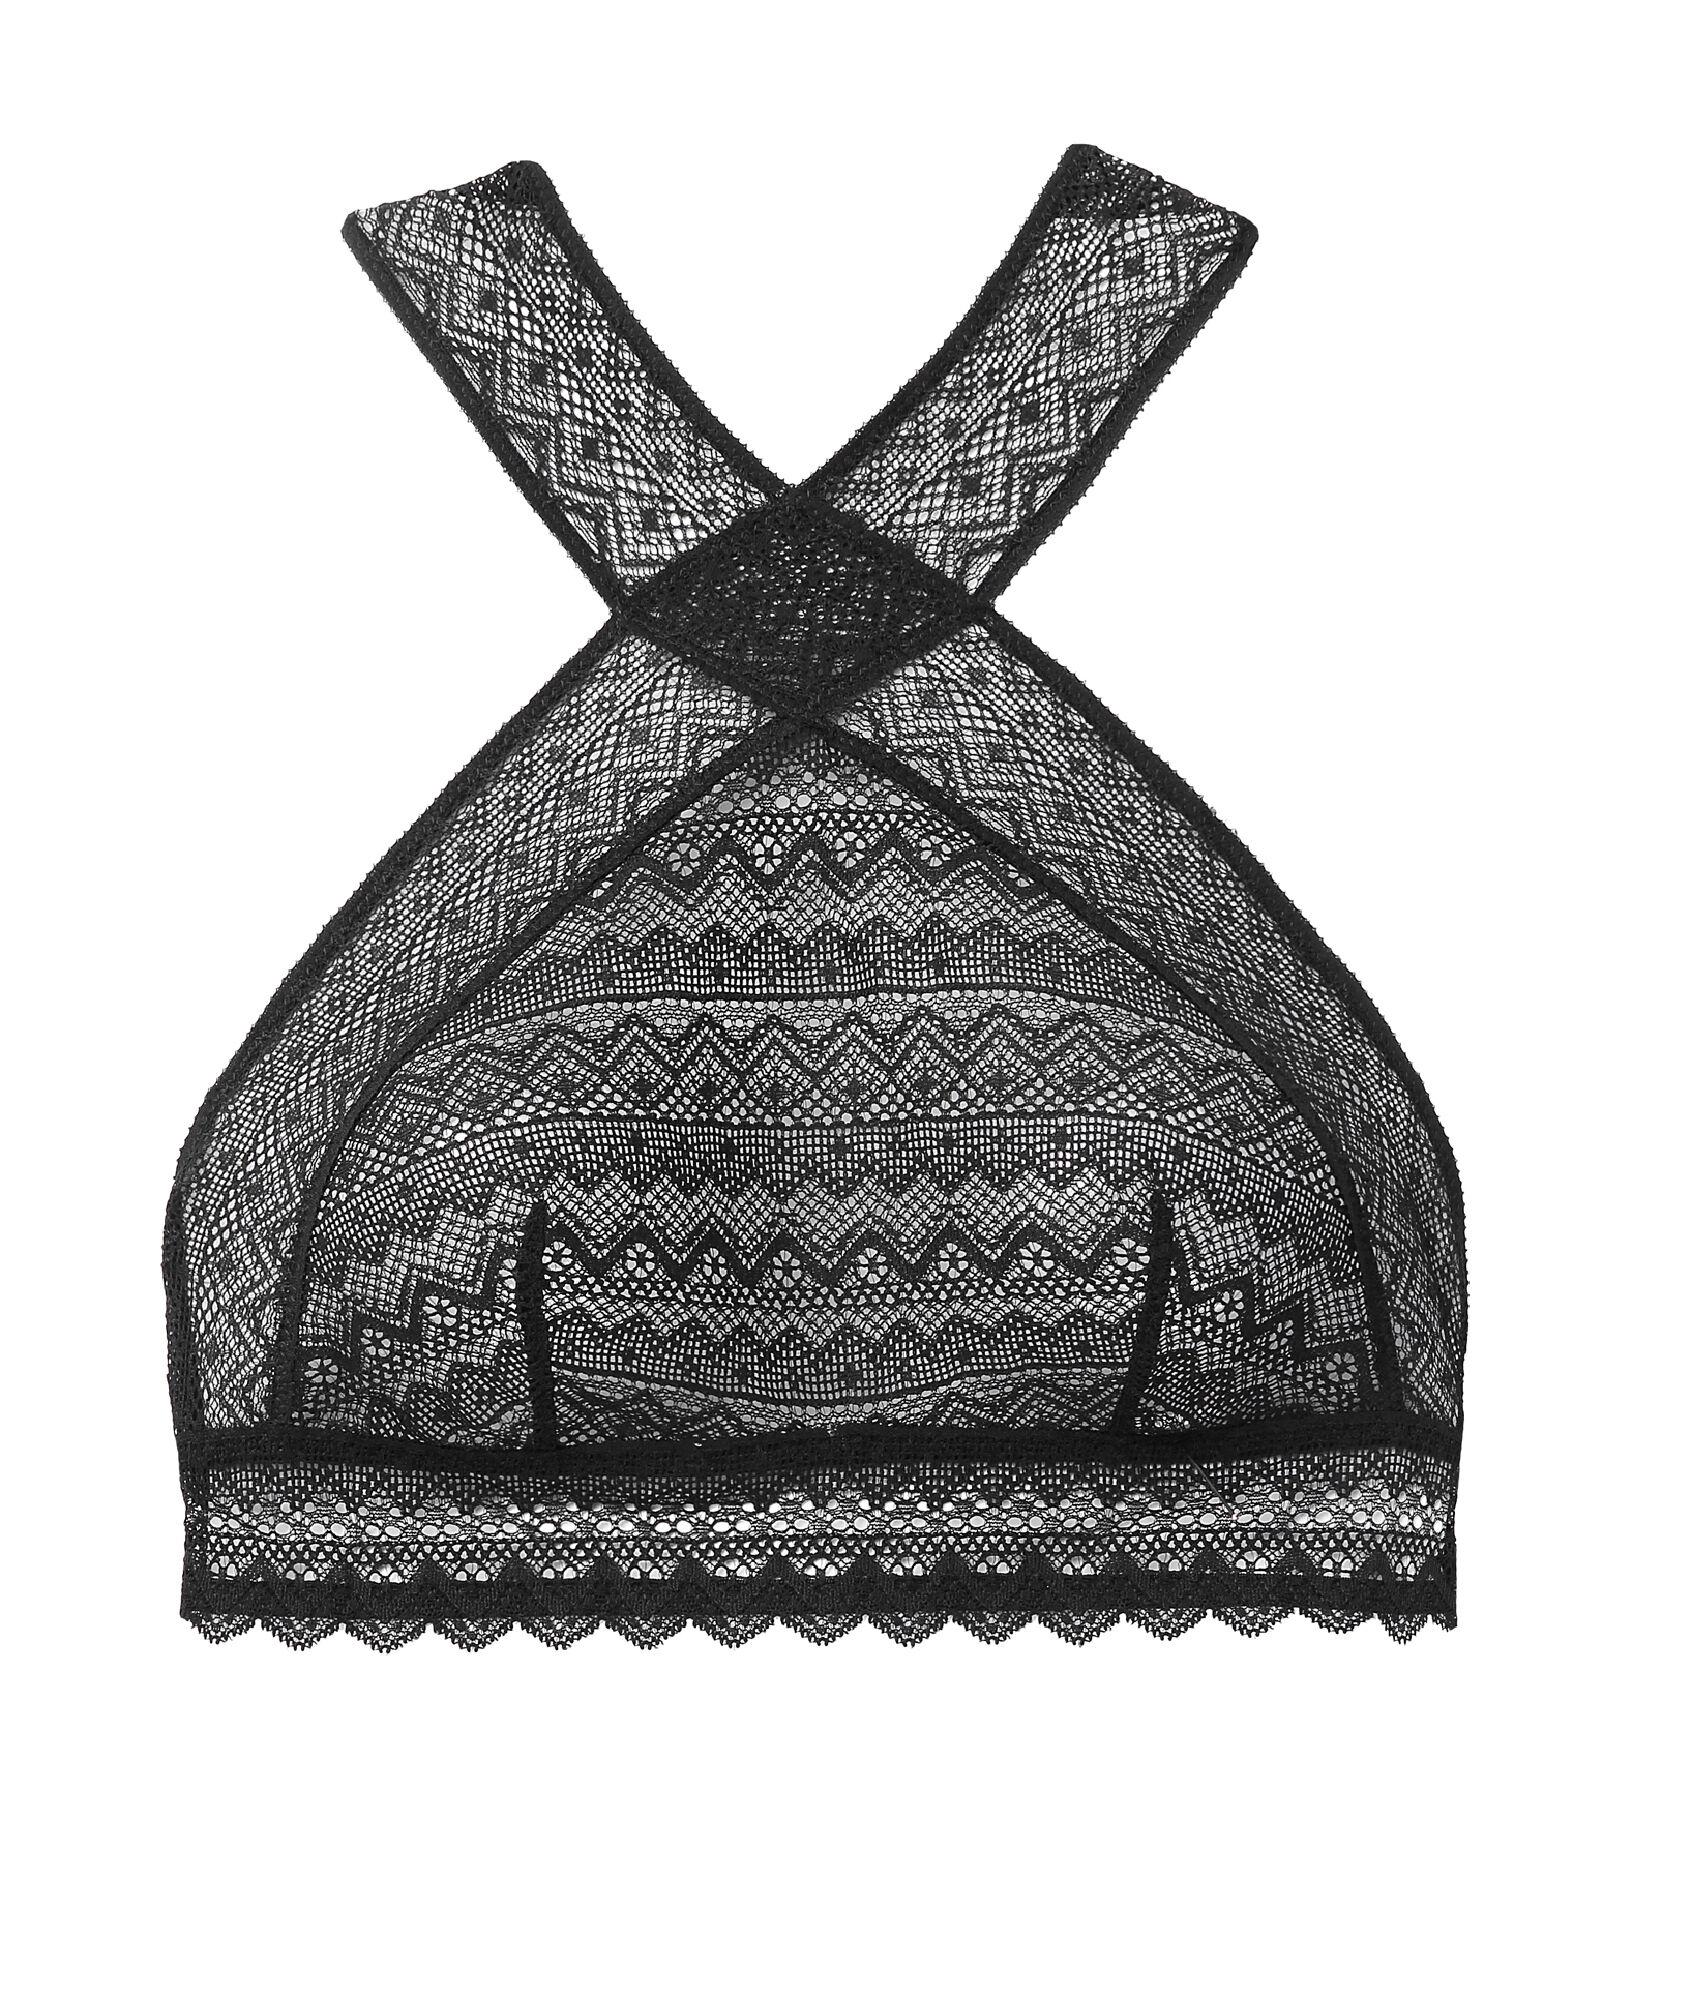 Bralette de encaje cuello choker - 101 ANS - NEGRO - Etam